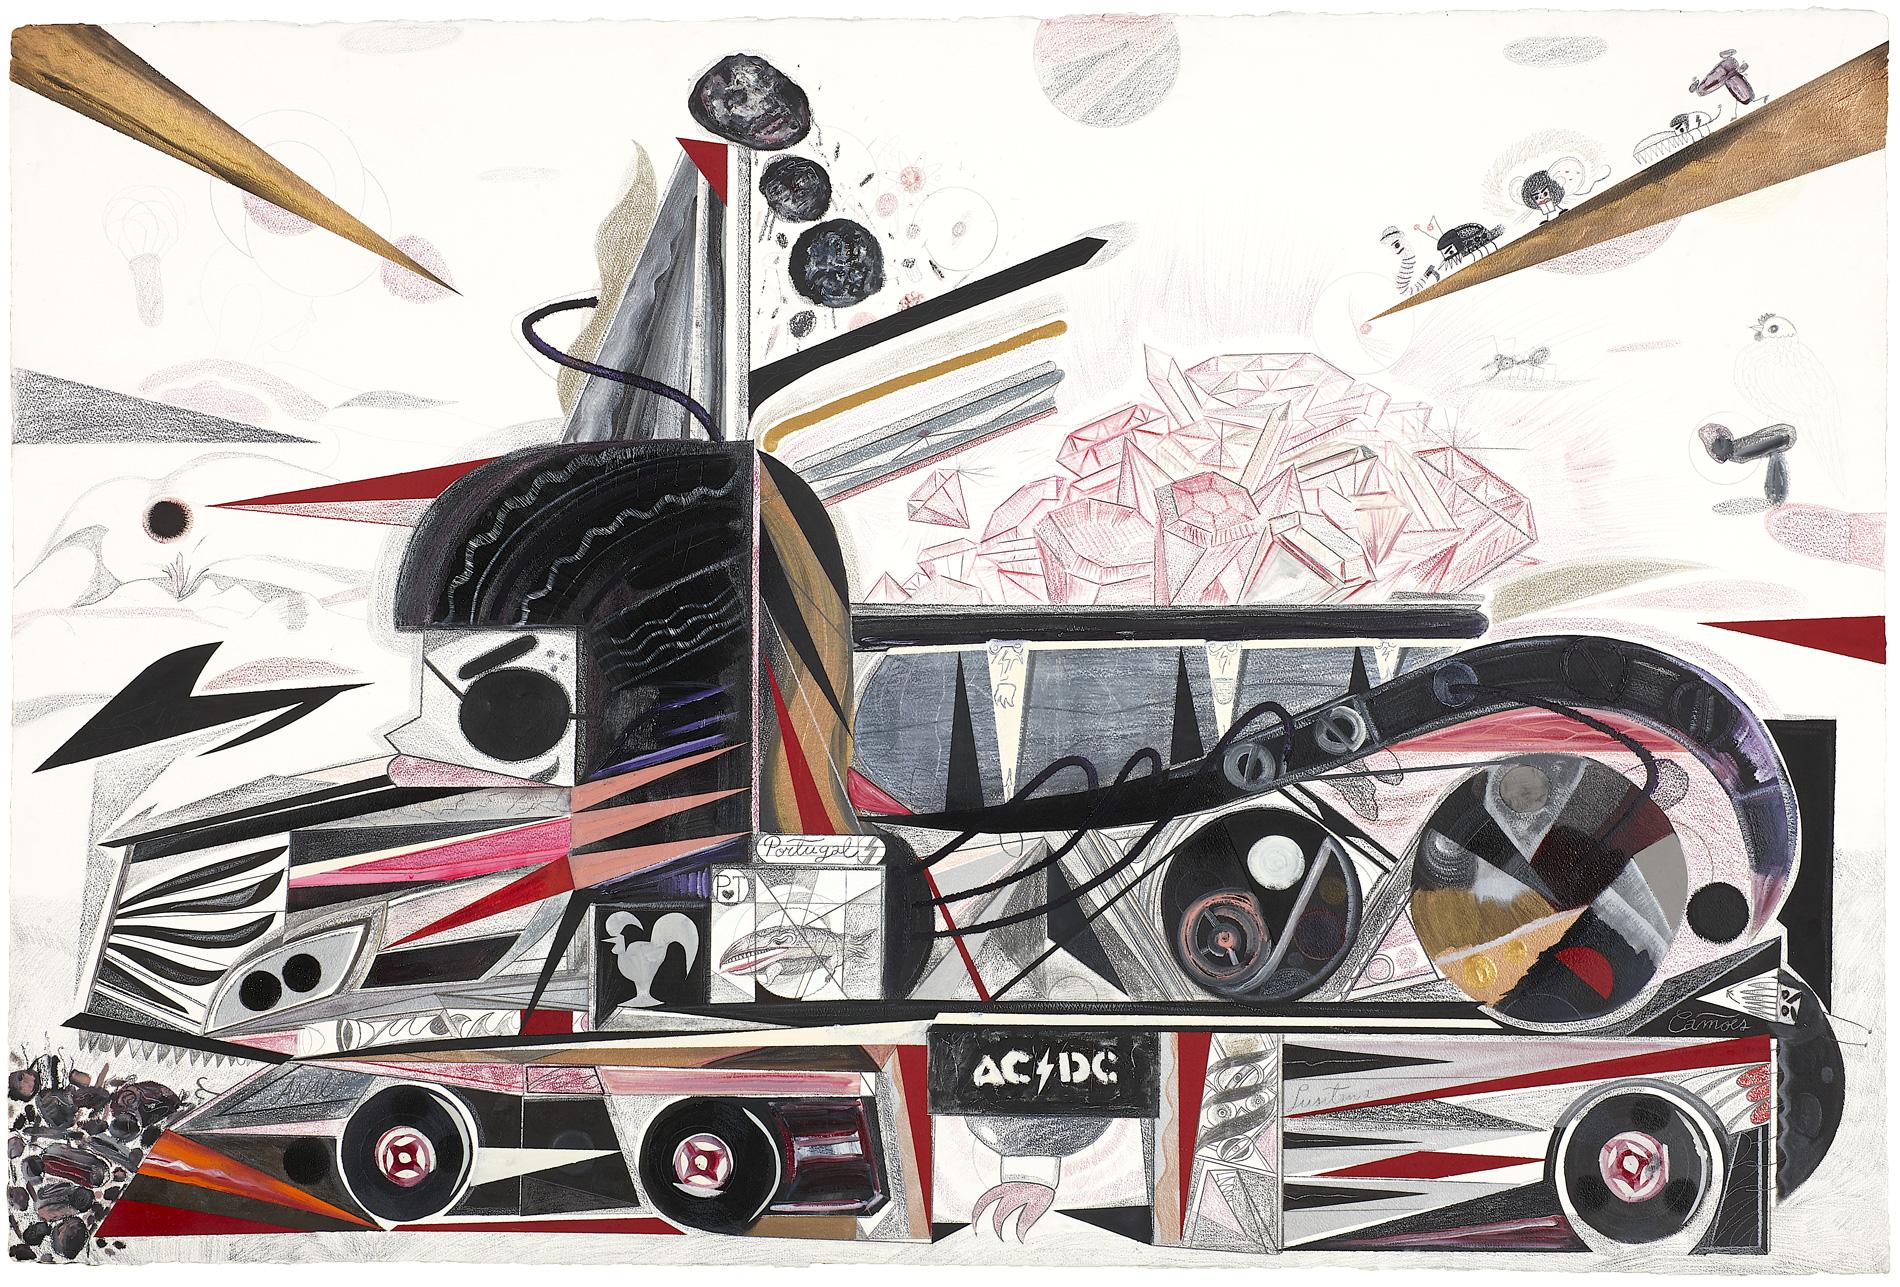 Abdul Vas. Cucarachon AC/DC Camoes 14060-Lusitania-Navistar, 2009